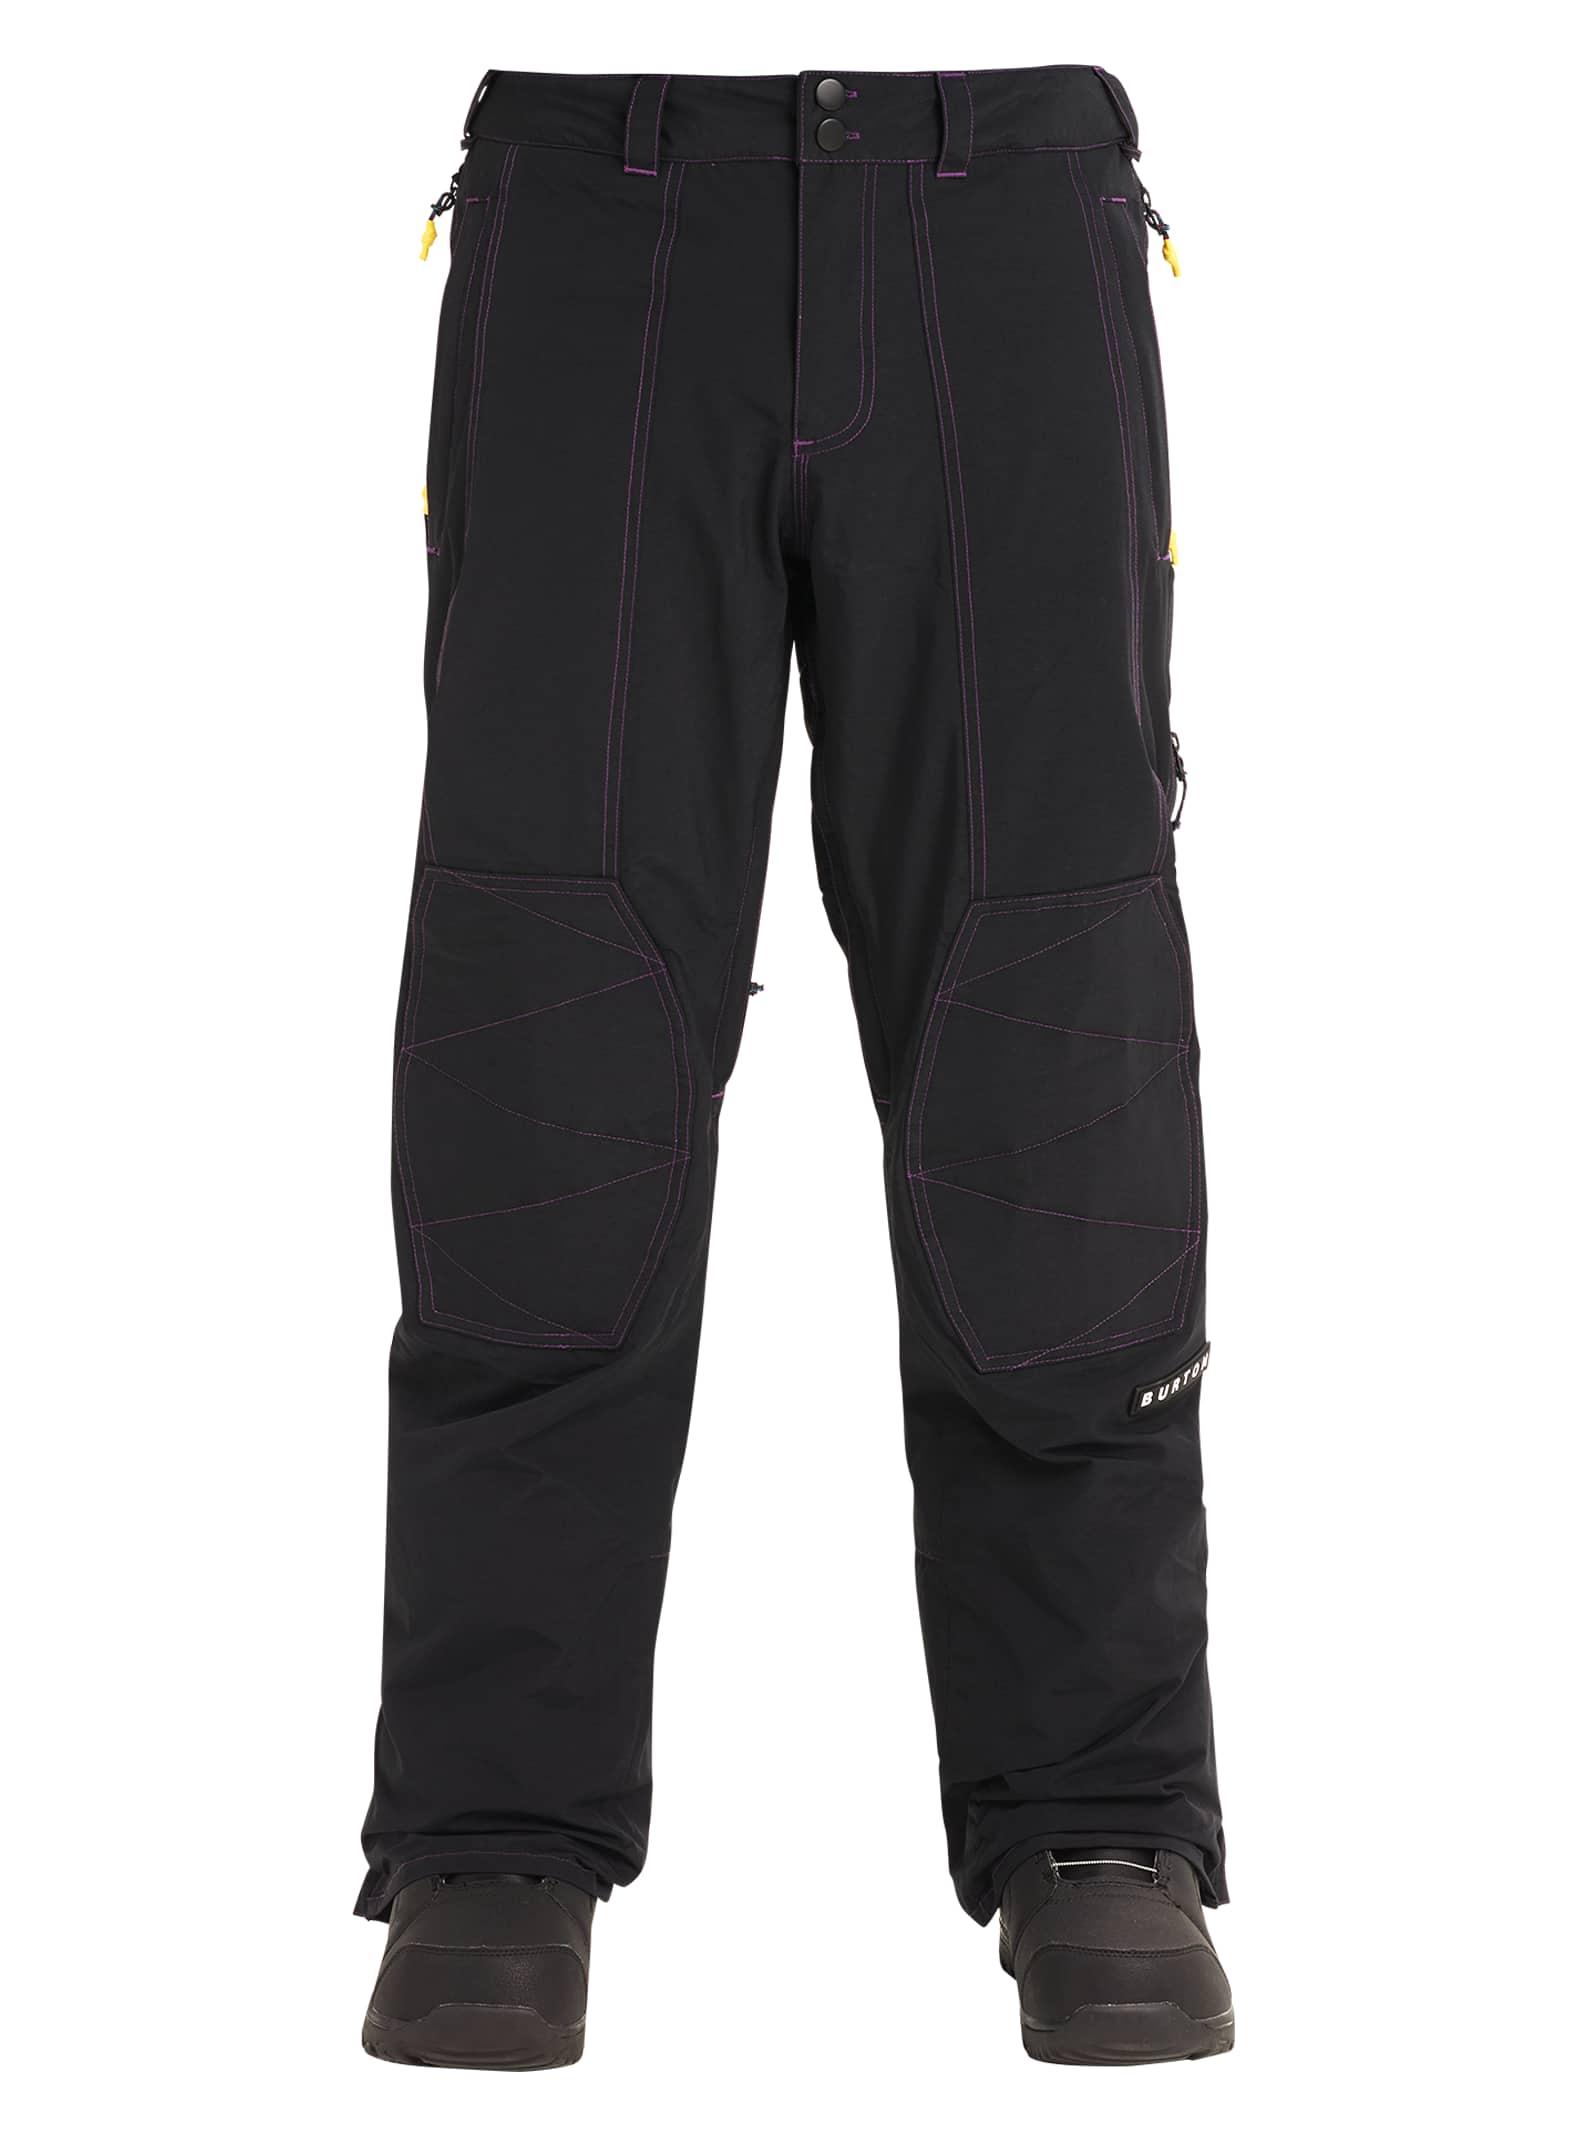 3b7ec75cfa Men's Snowboard Pants & Bibs | Burton Snowboards